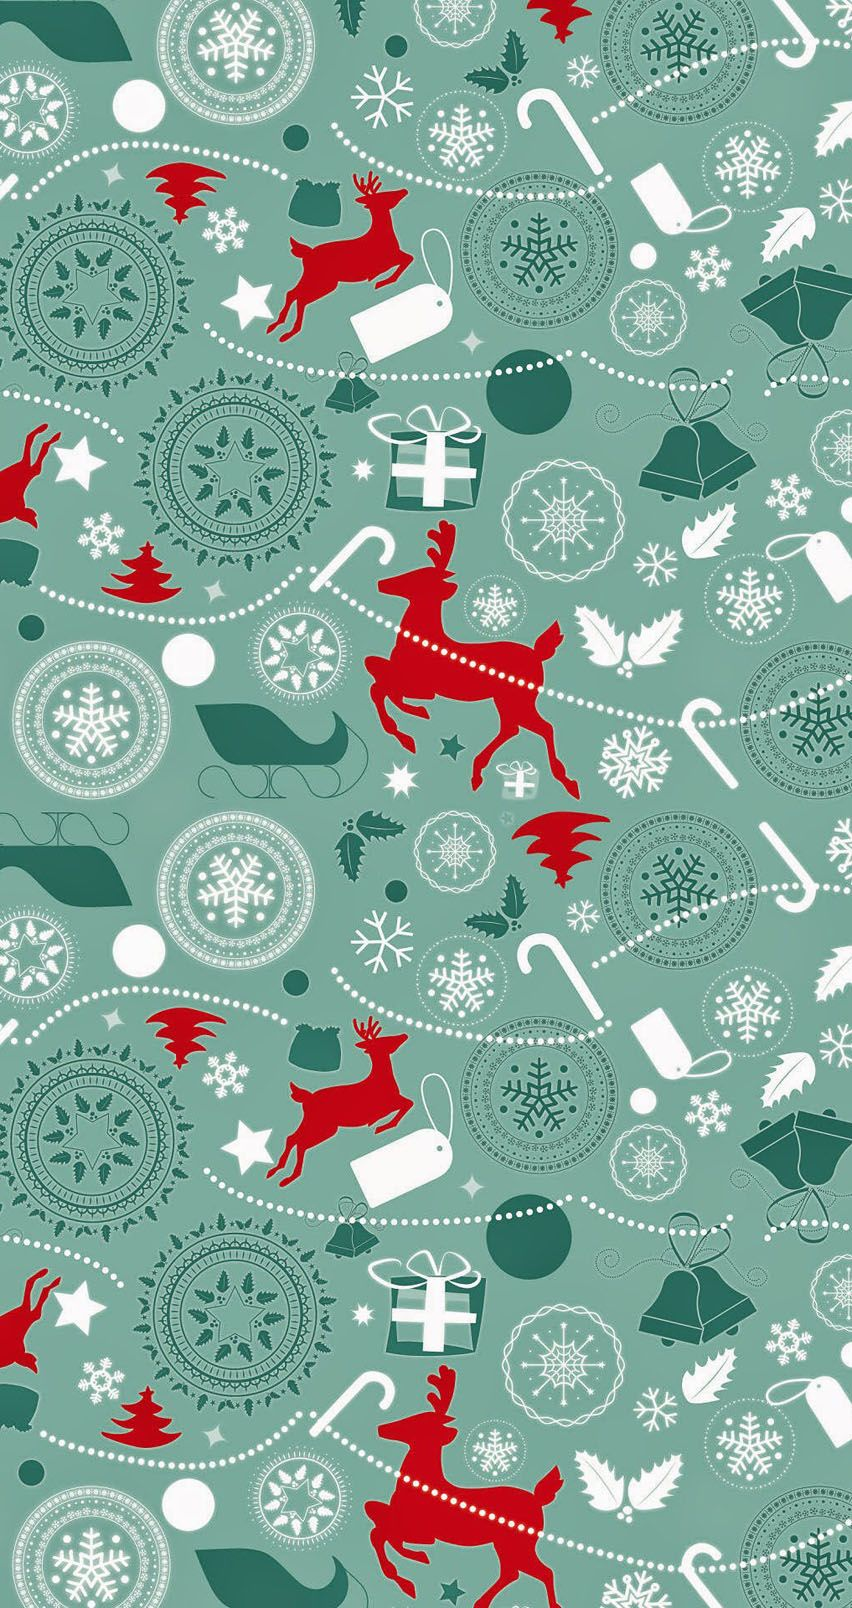 Merry Christmas Background Christmas Phone Wallpaper Wallpaper Iphone Christmas Christmas Tree Wallpaper Iphone